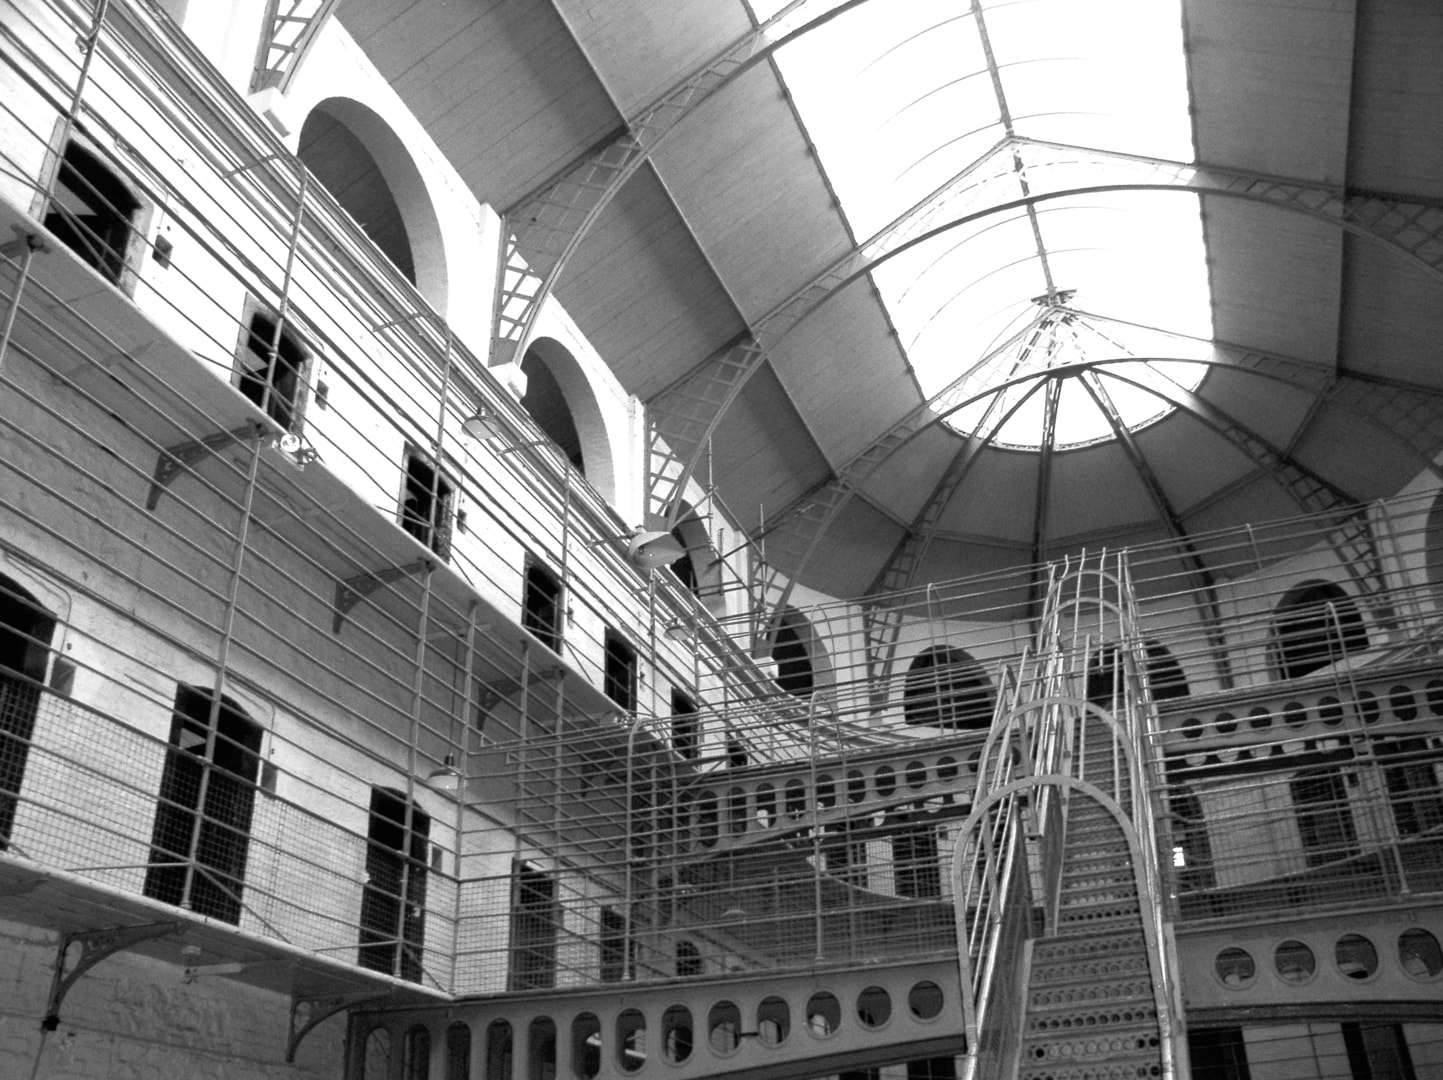 Studietur Dublin Kilmainham Gaol